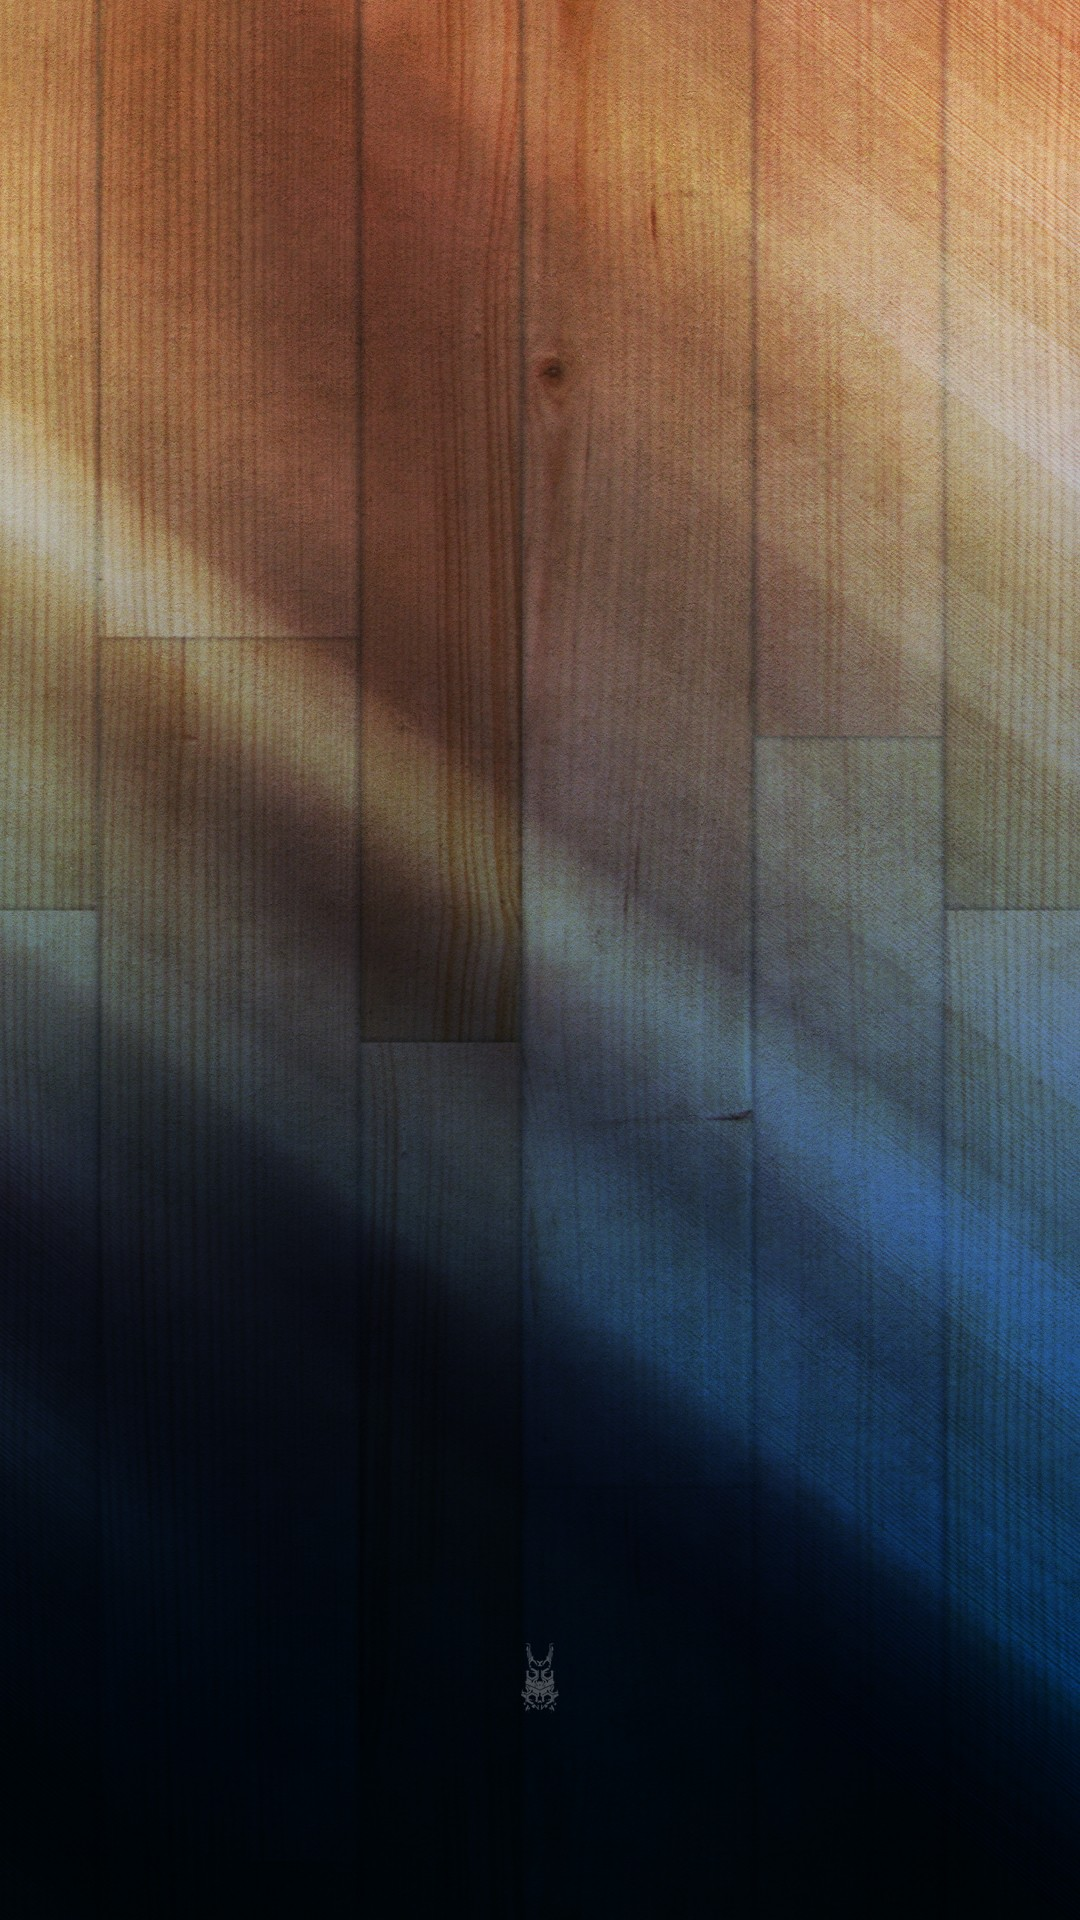 the matrixer wallpaper iphone smartphone samsung galaxy nokia